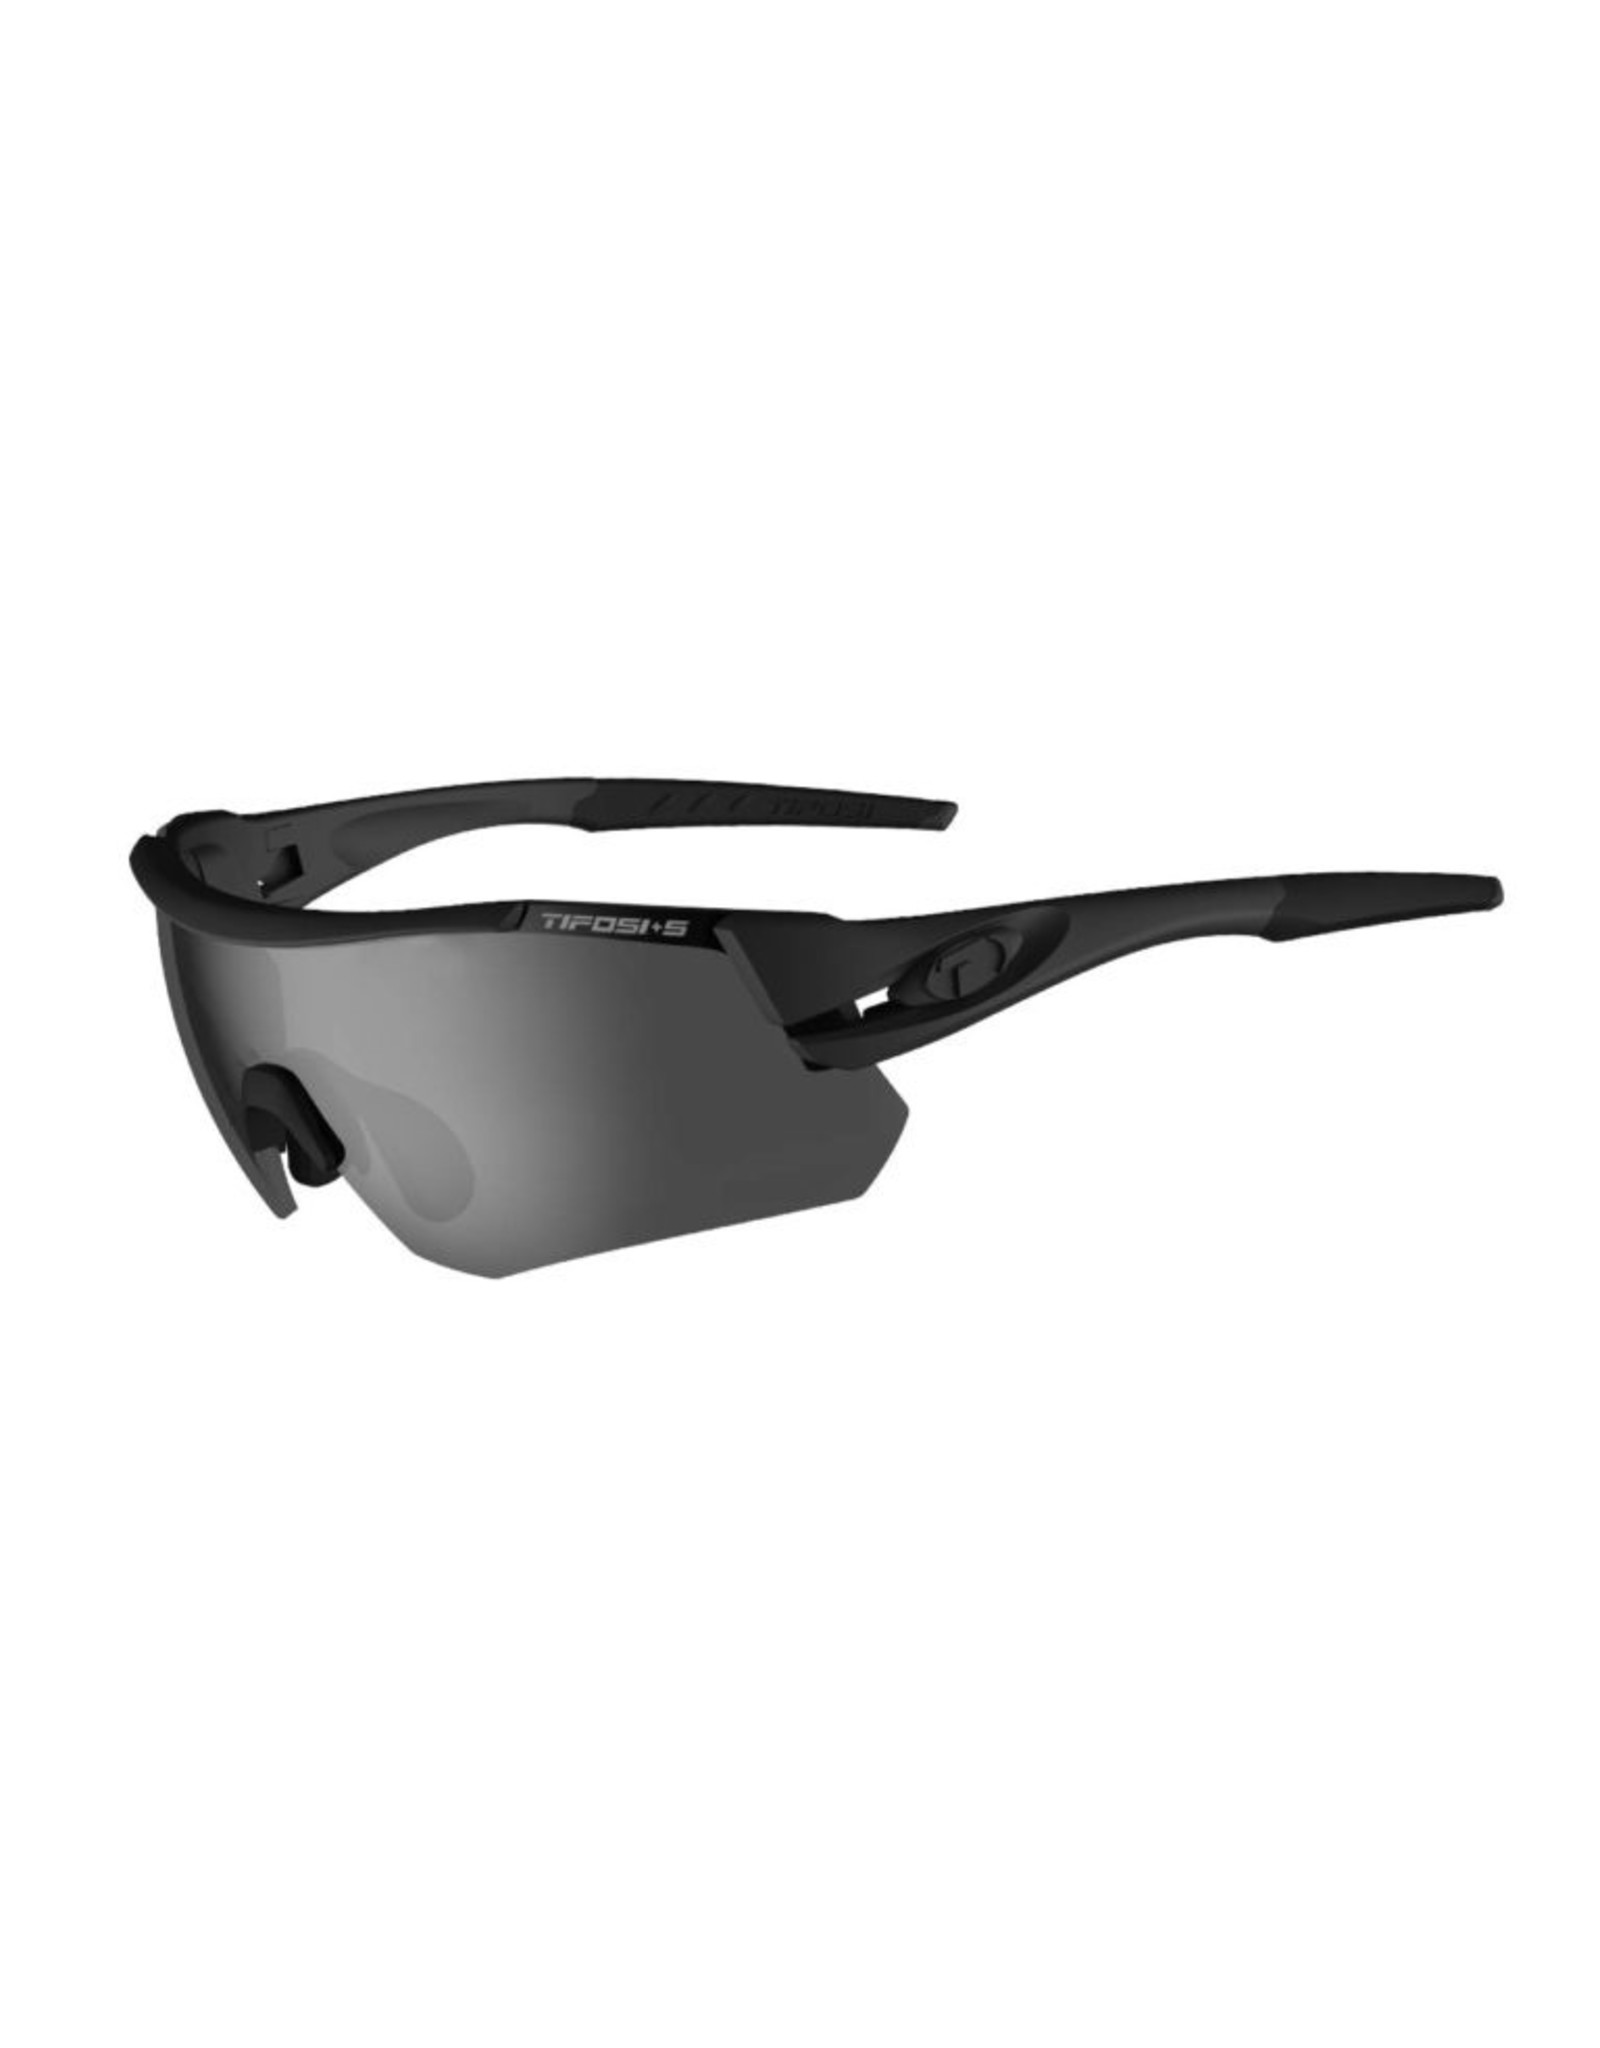 Tifosi Optics Z87.1 Alliant, Matte Black Tactical Safety Sunglasses - Smoke/HC Red/Clear